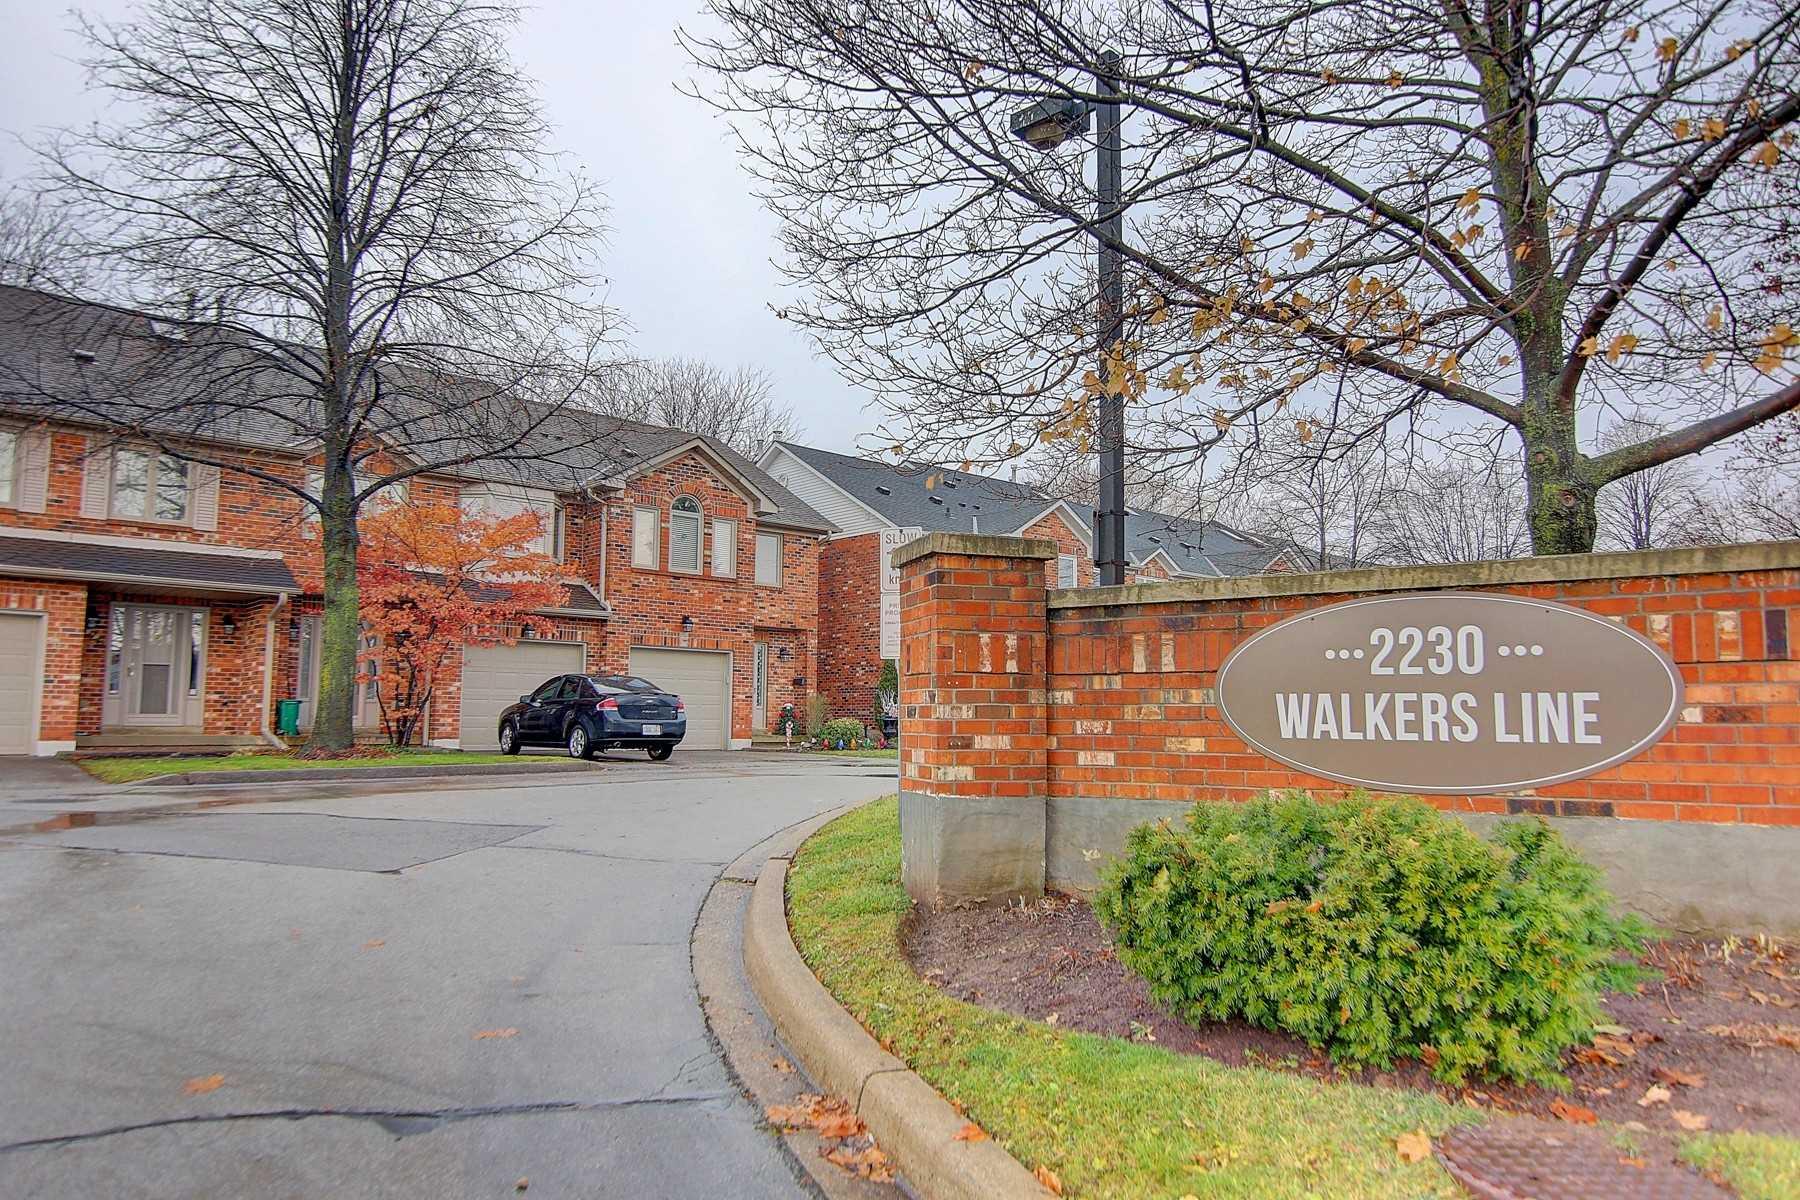 2230 Walker's Line, Burlington